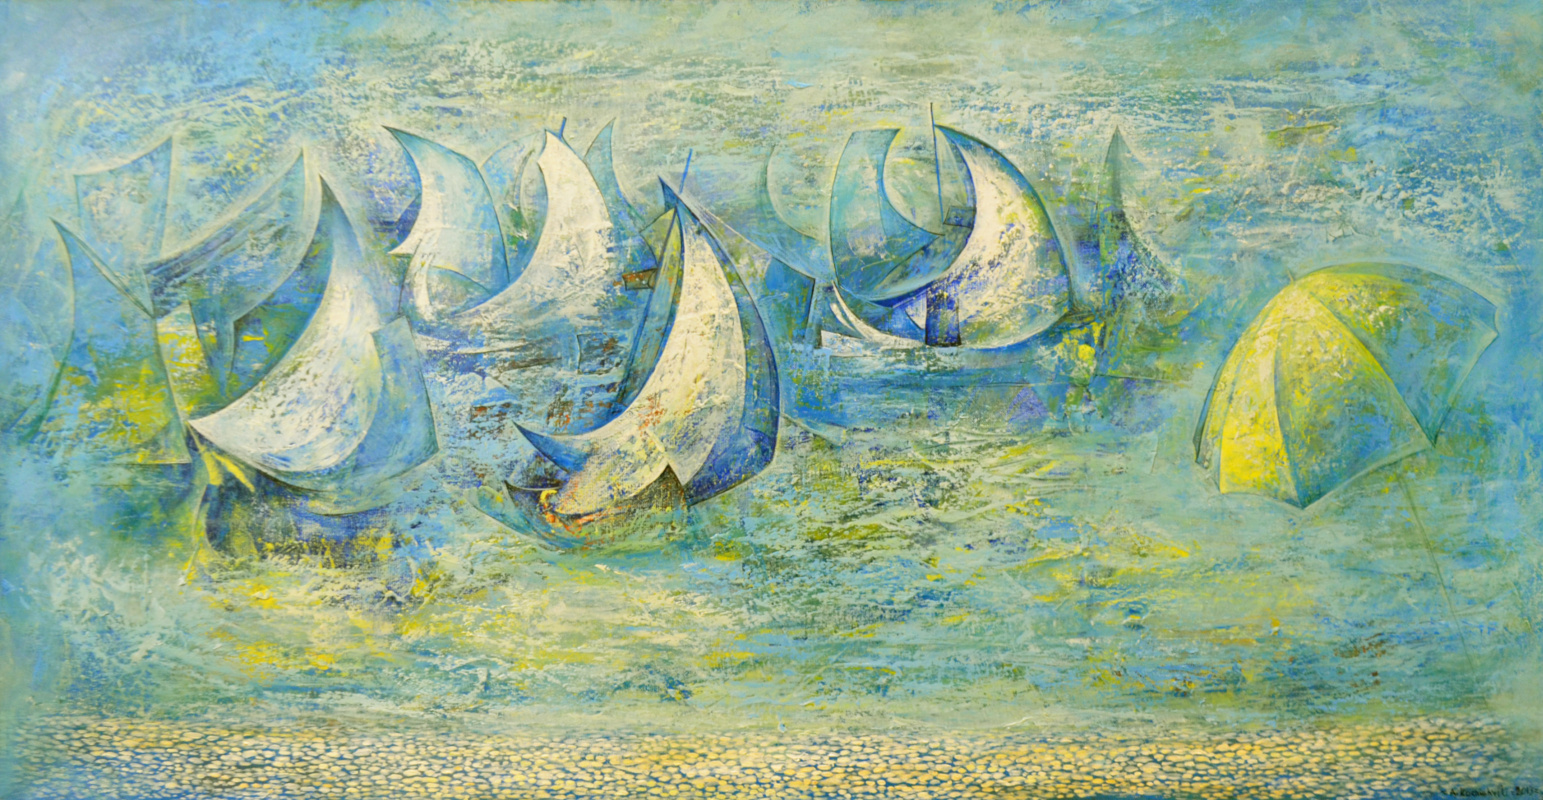 Amur Kochishvili. She will be mine. Sails in the rain.